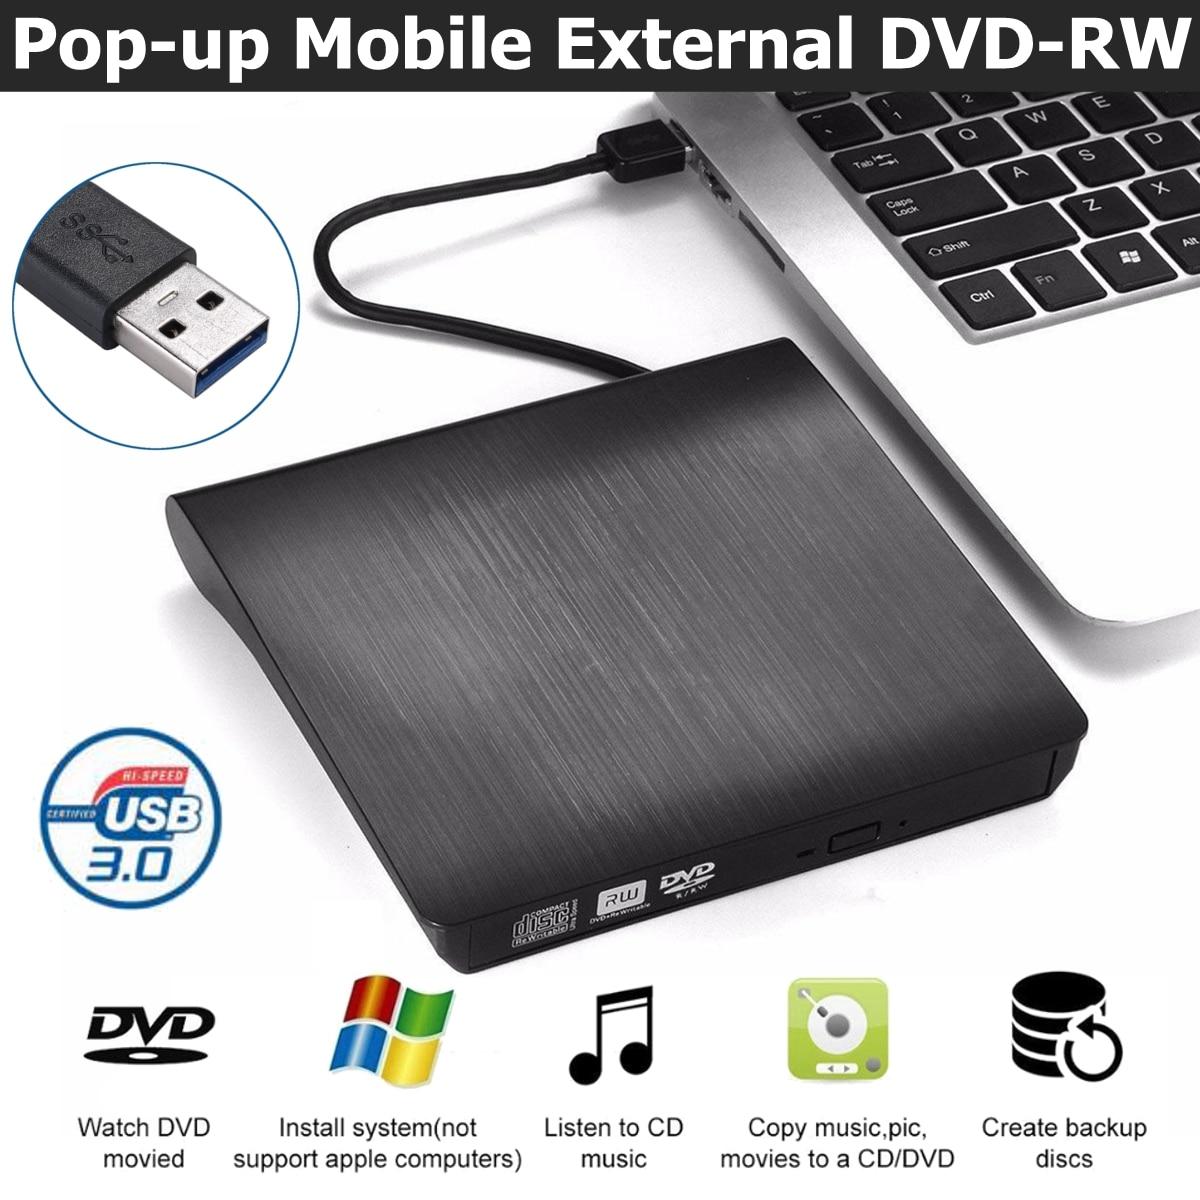 USB 3,0 externo Delgado DVD RW CD Drive quemador lector jugador unidades ópticas para PC portátil